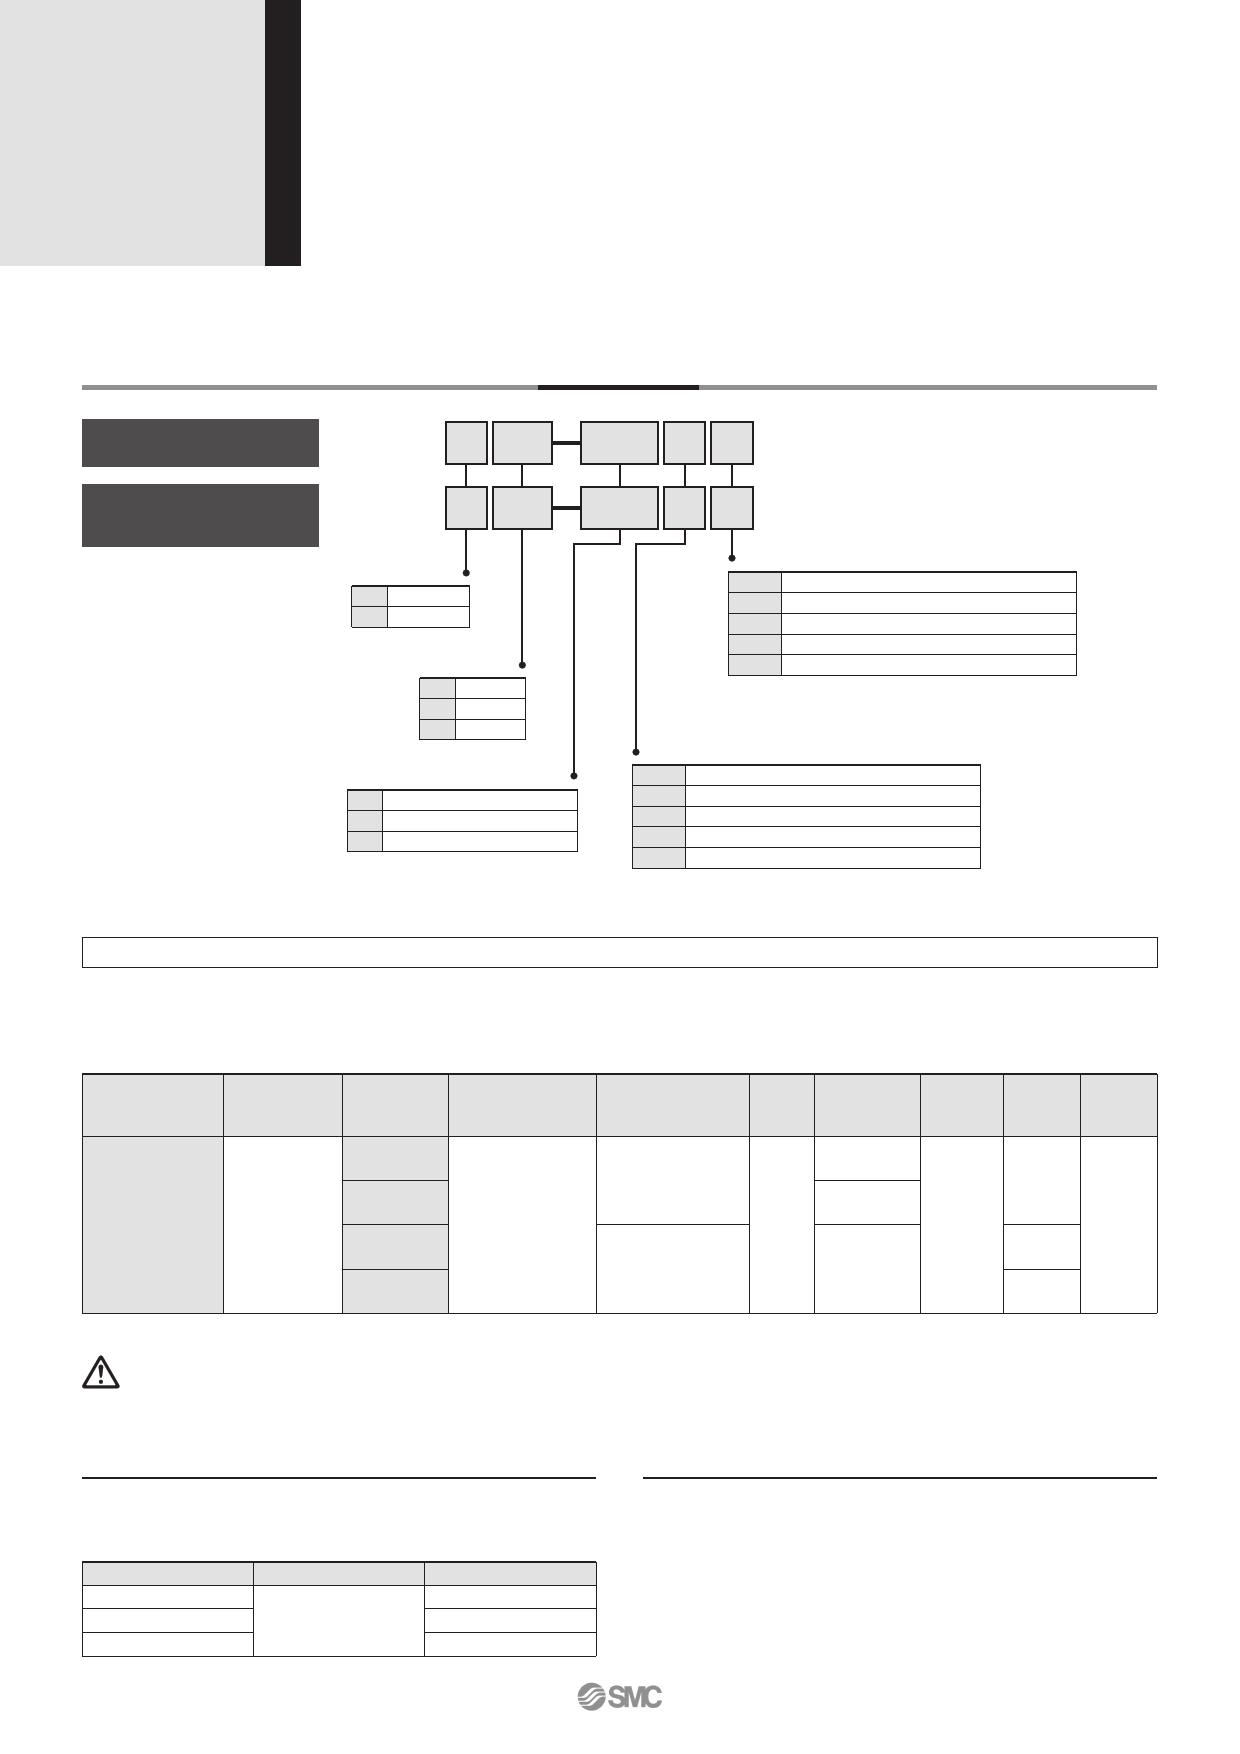 D-P79WSE datasheet